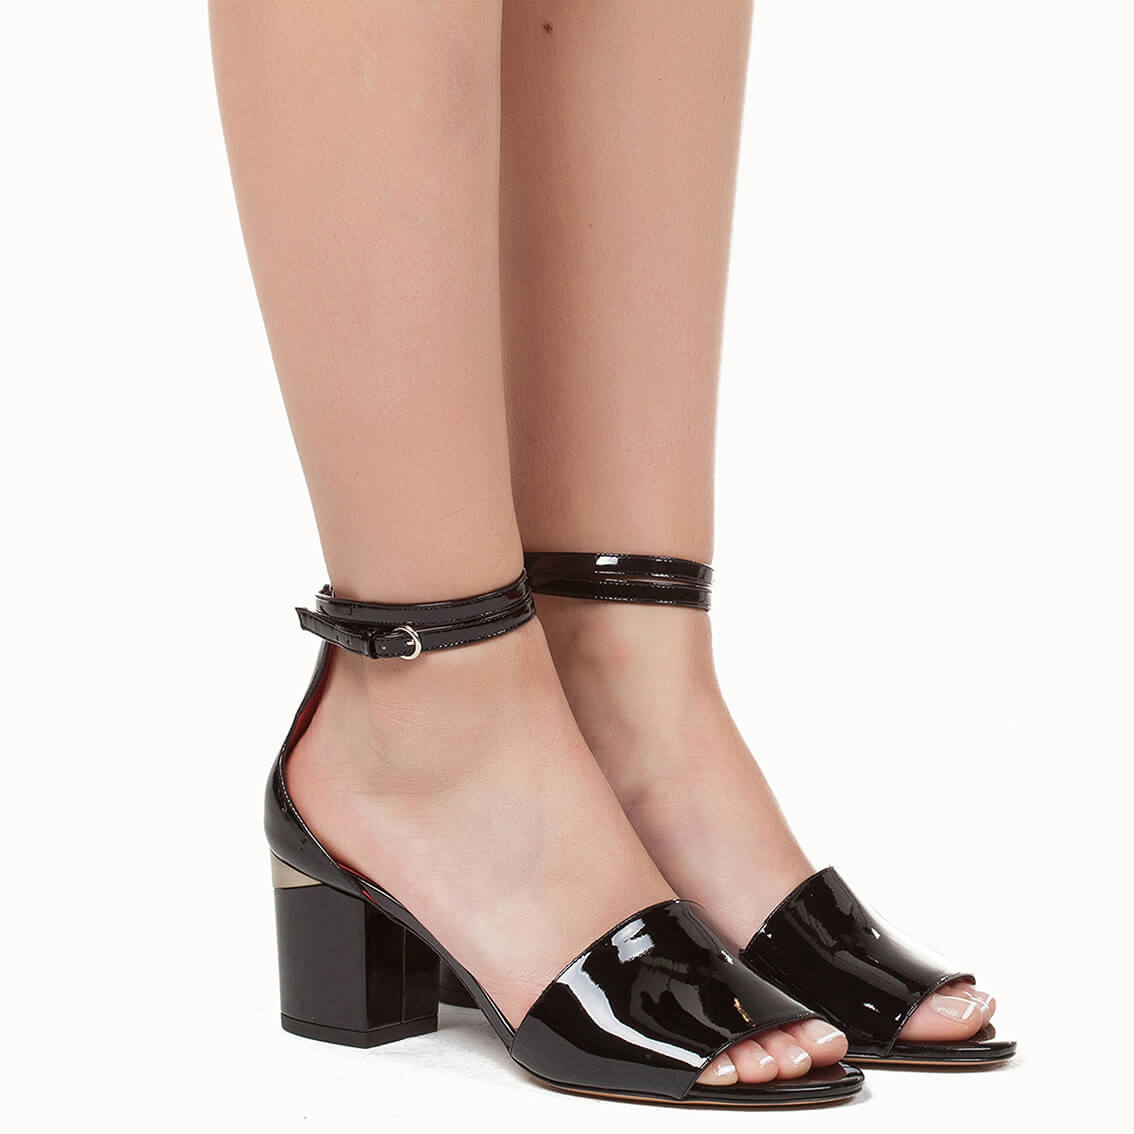 Sandalias Zapatos Negras De López Ancho Tienda Tacón Pura UzVpqMSG